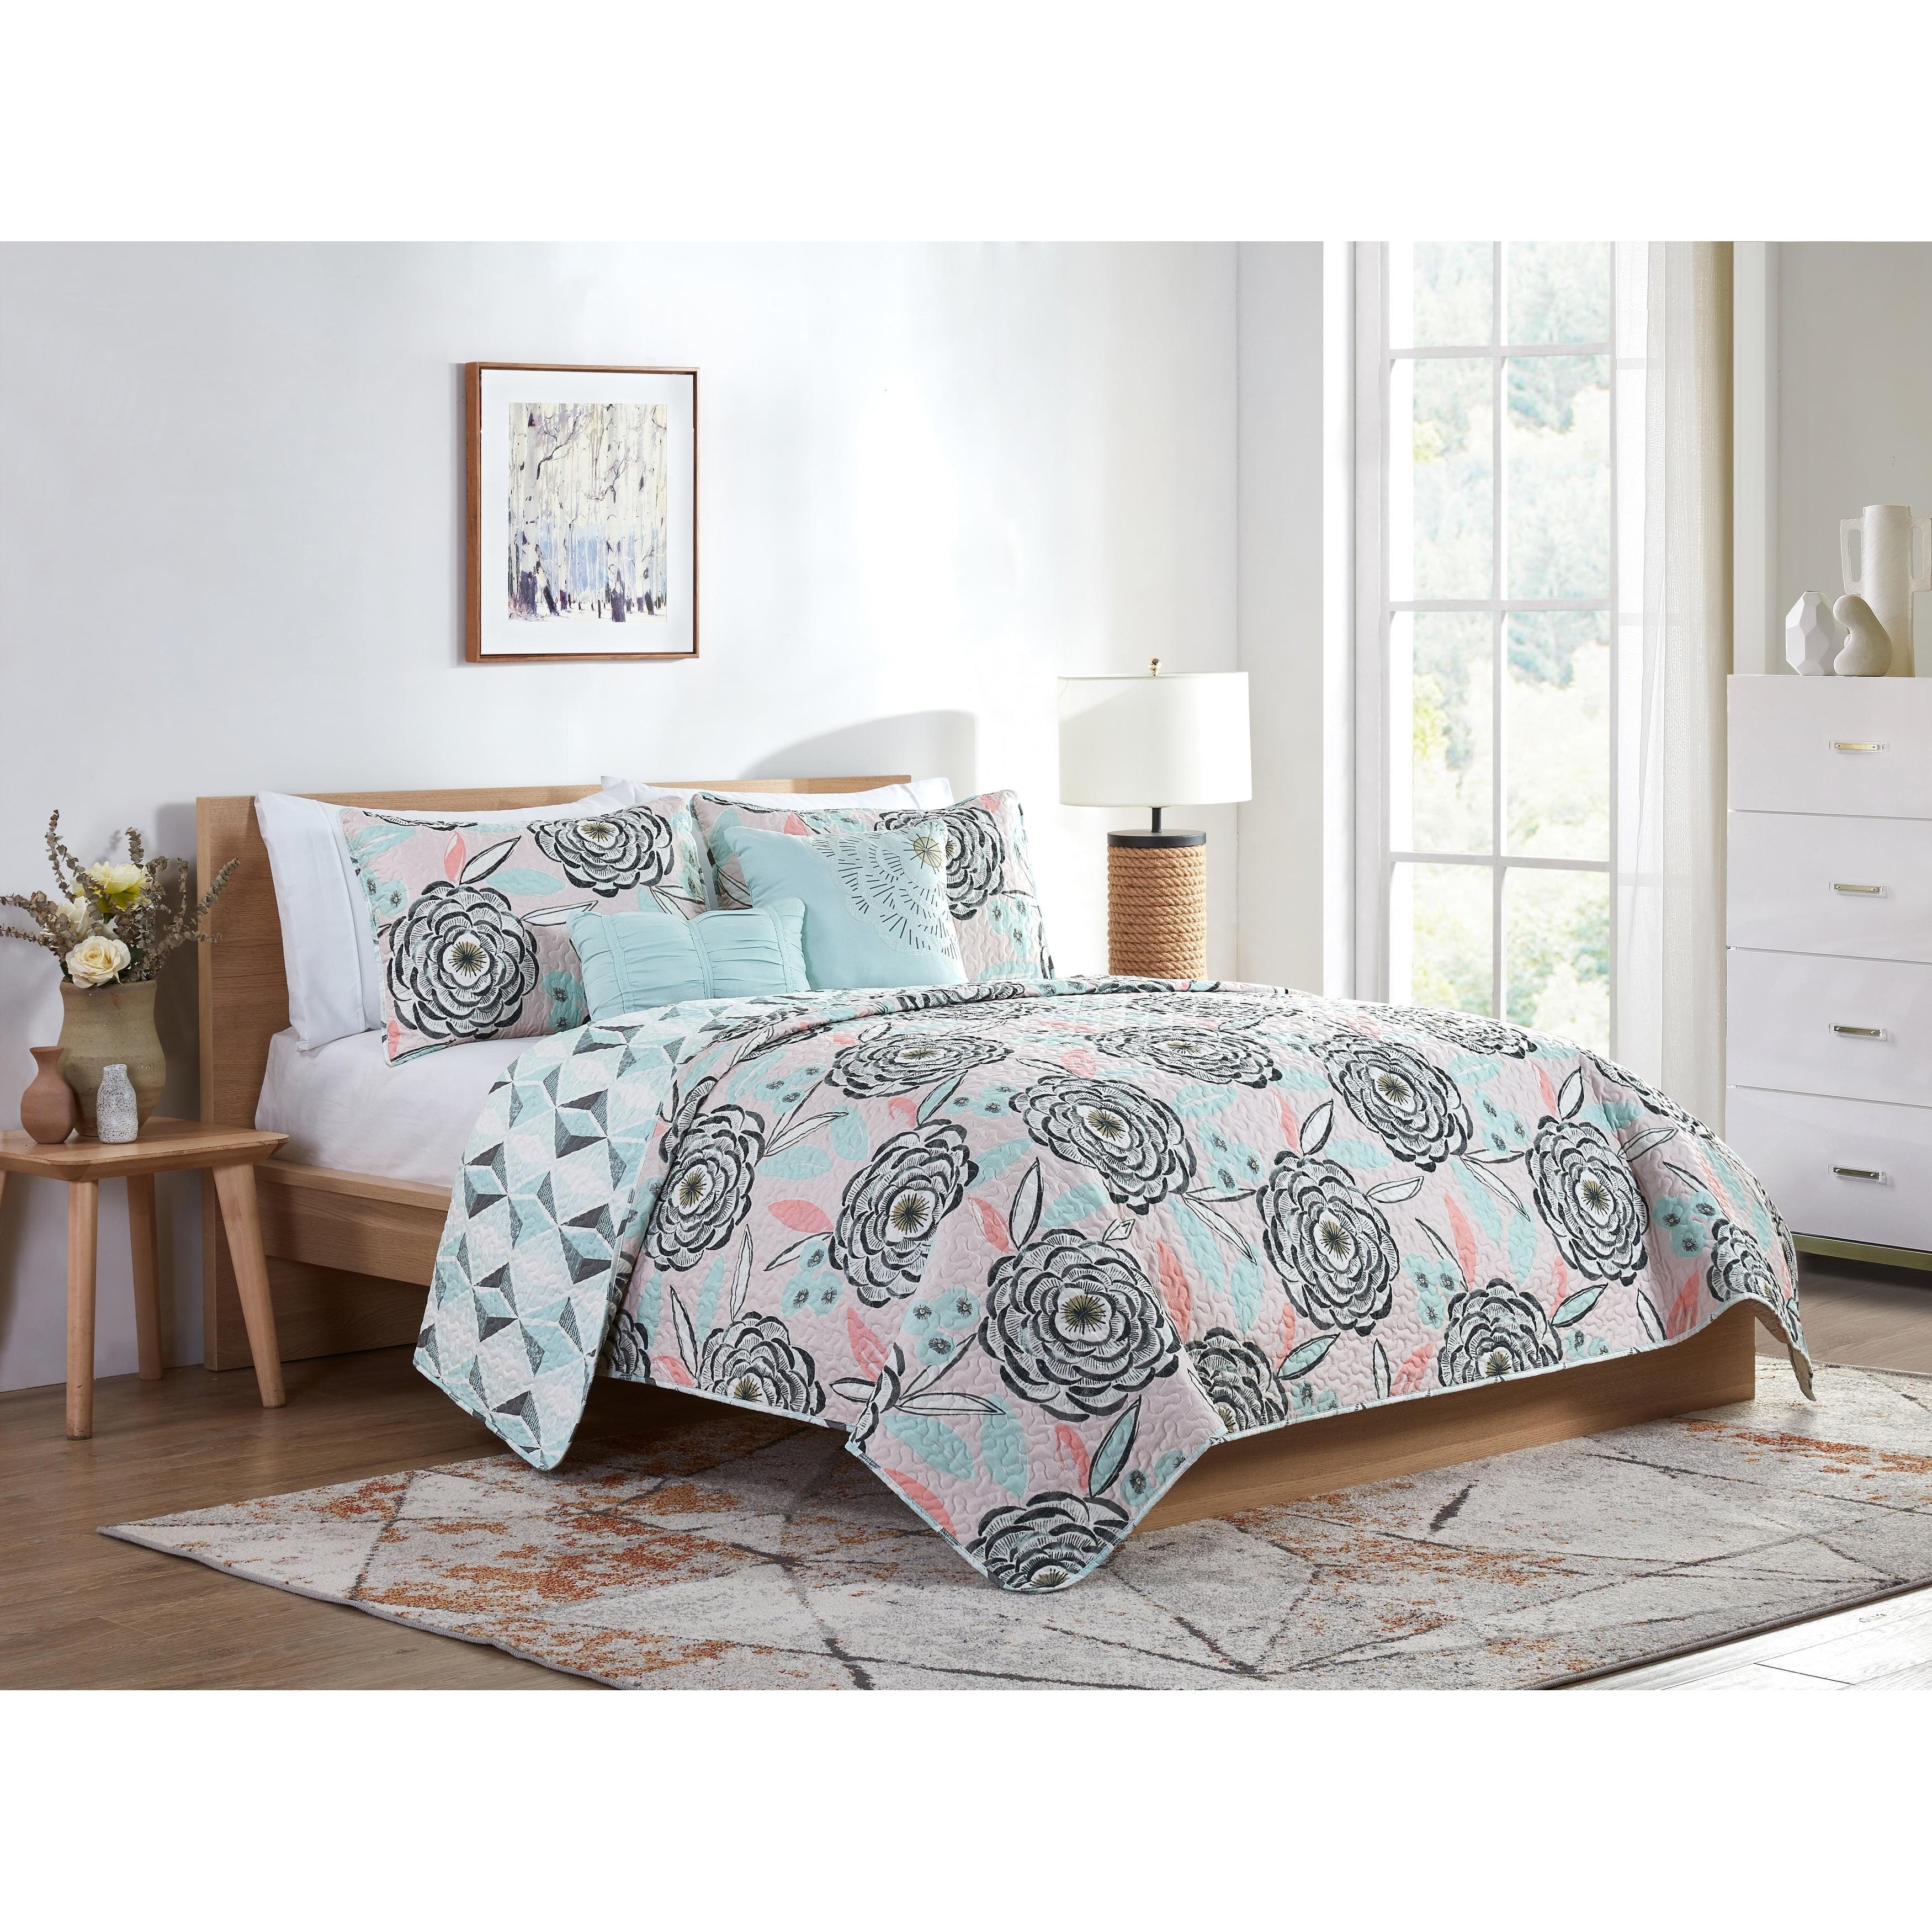 VCNY  Home Shayla Reversible Floral Comforter Set